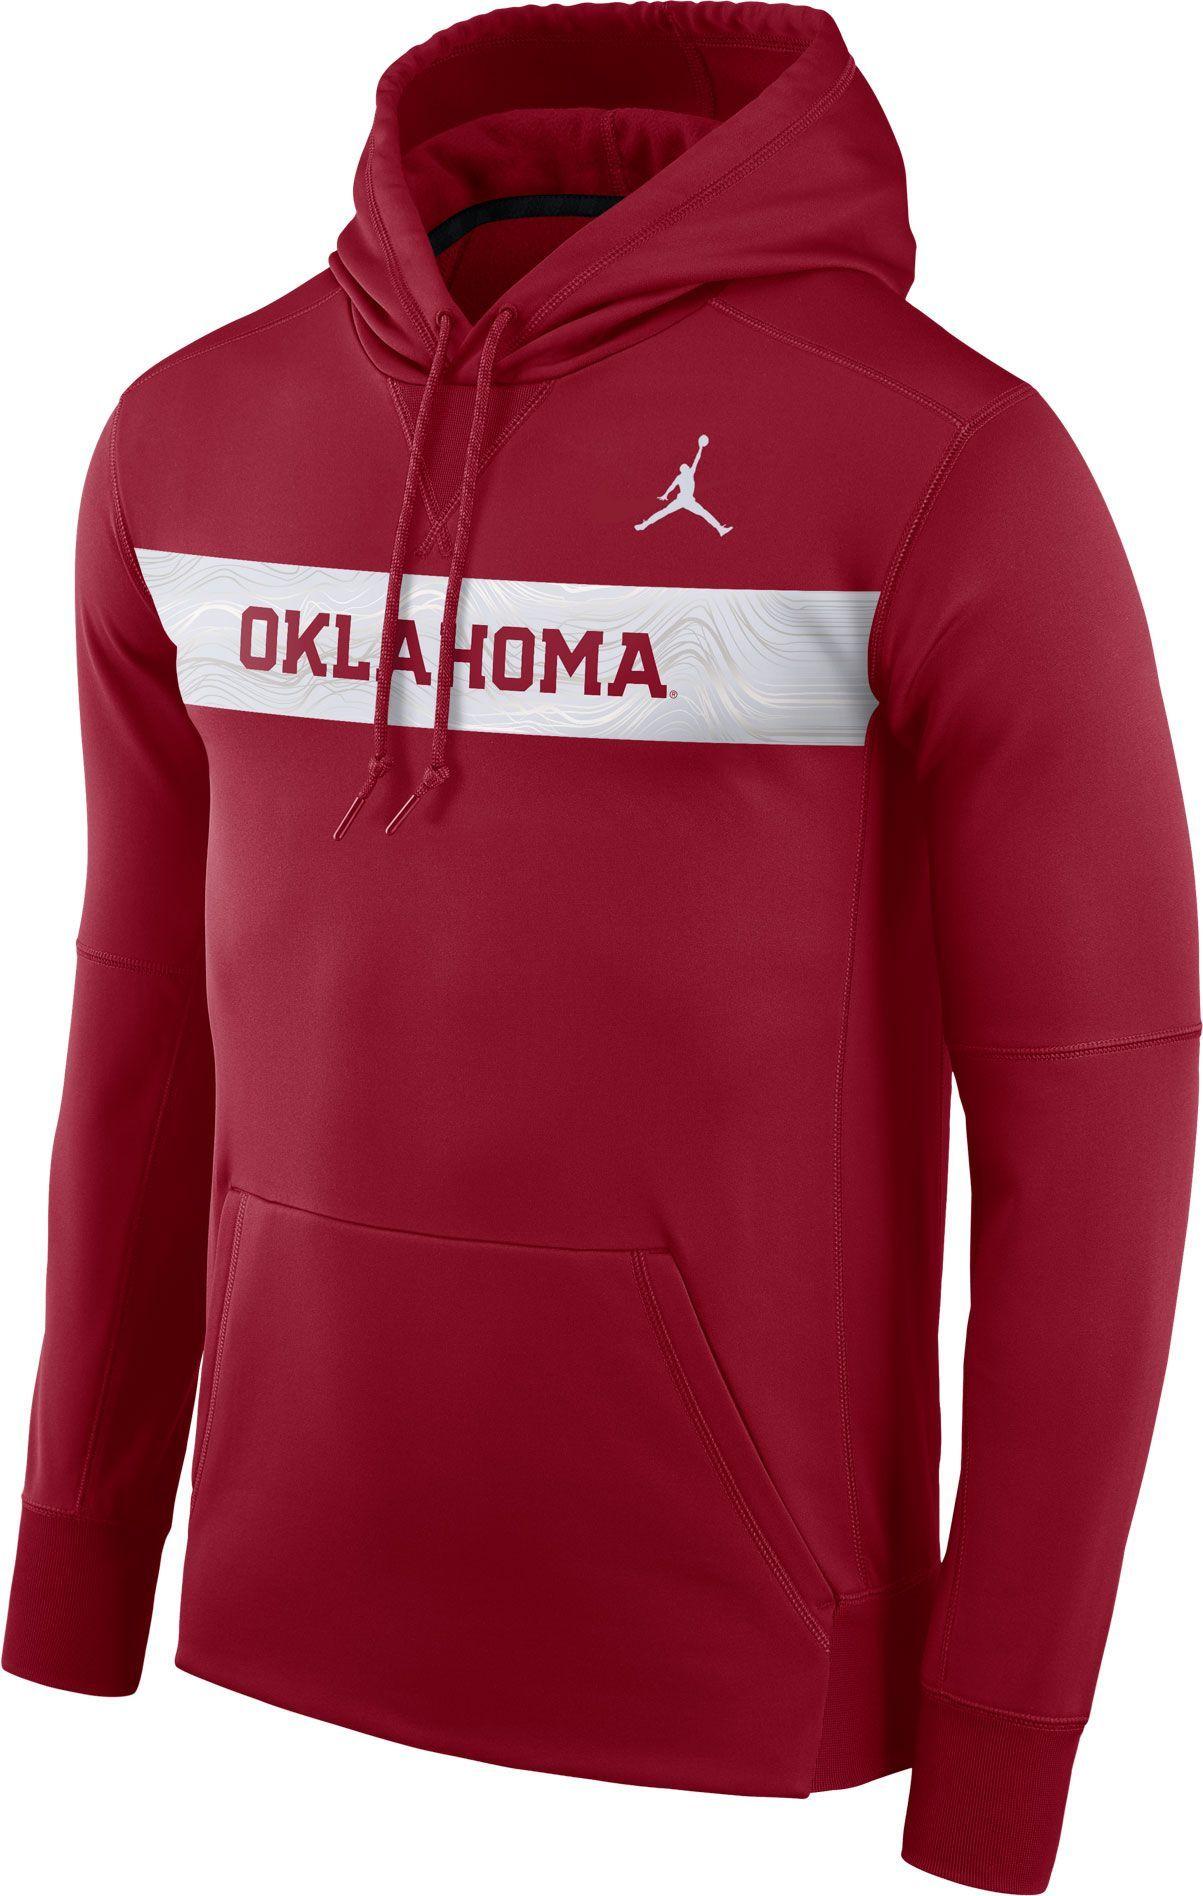 b67306eb4bf Jordan Men's Oklahoma Sooners Crimson Therma-FIT Pullover Sideline Hoodie,  Multi